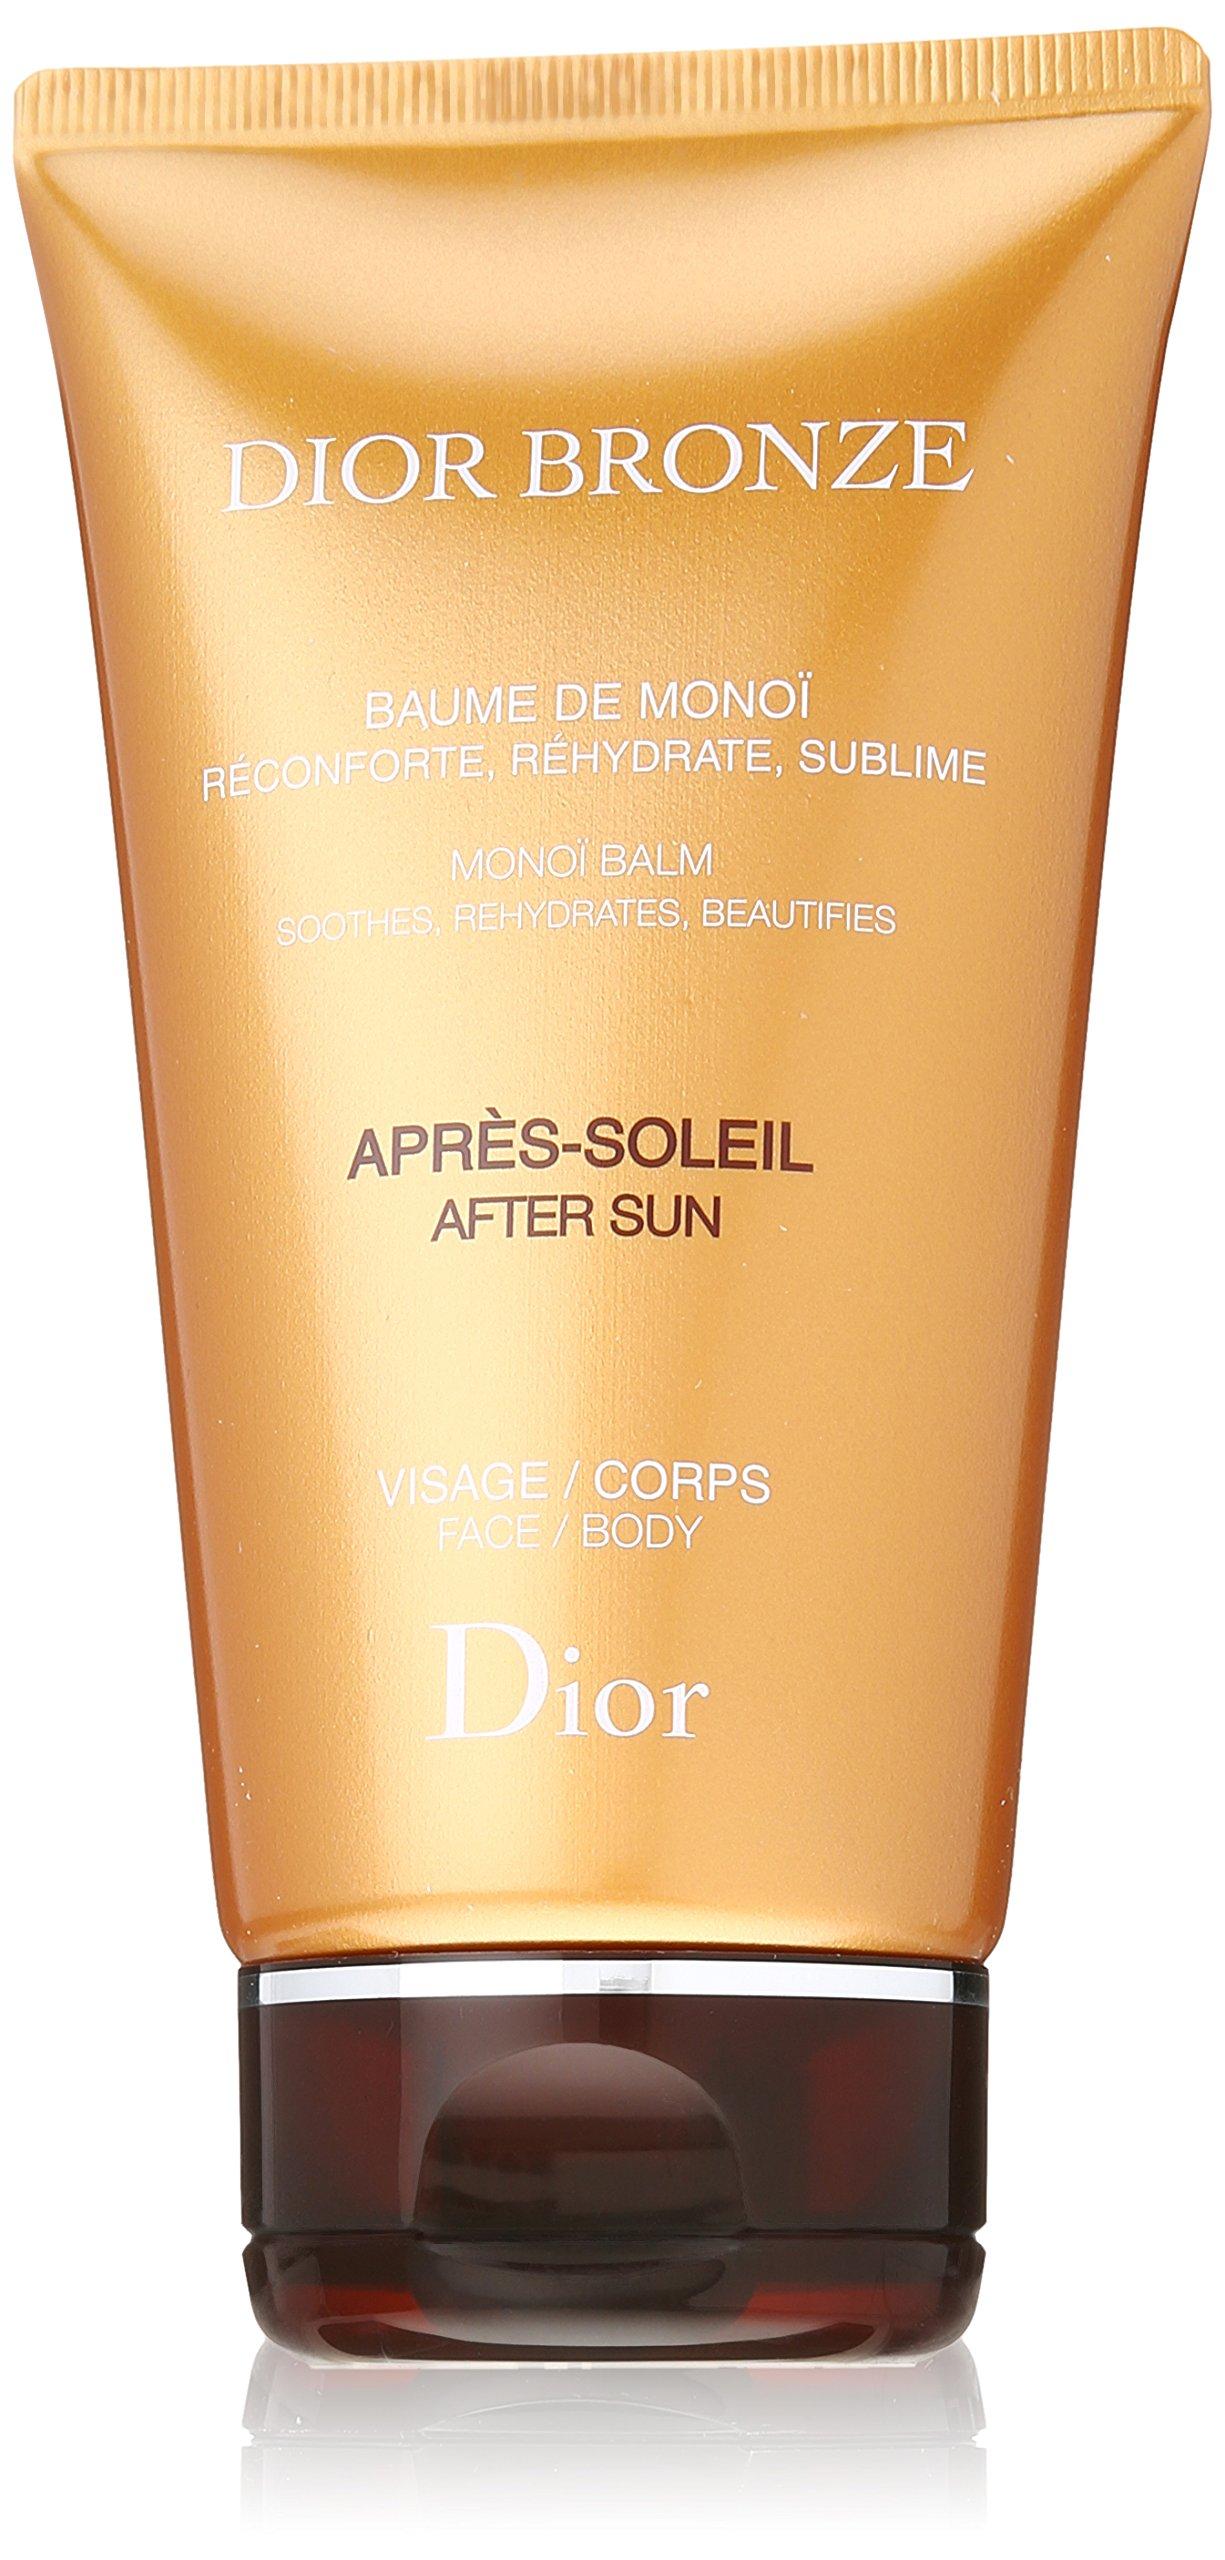 Christian Dior Bronze After Sun Monoi Balm for Unisex, 5.2 Ounce